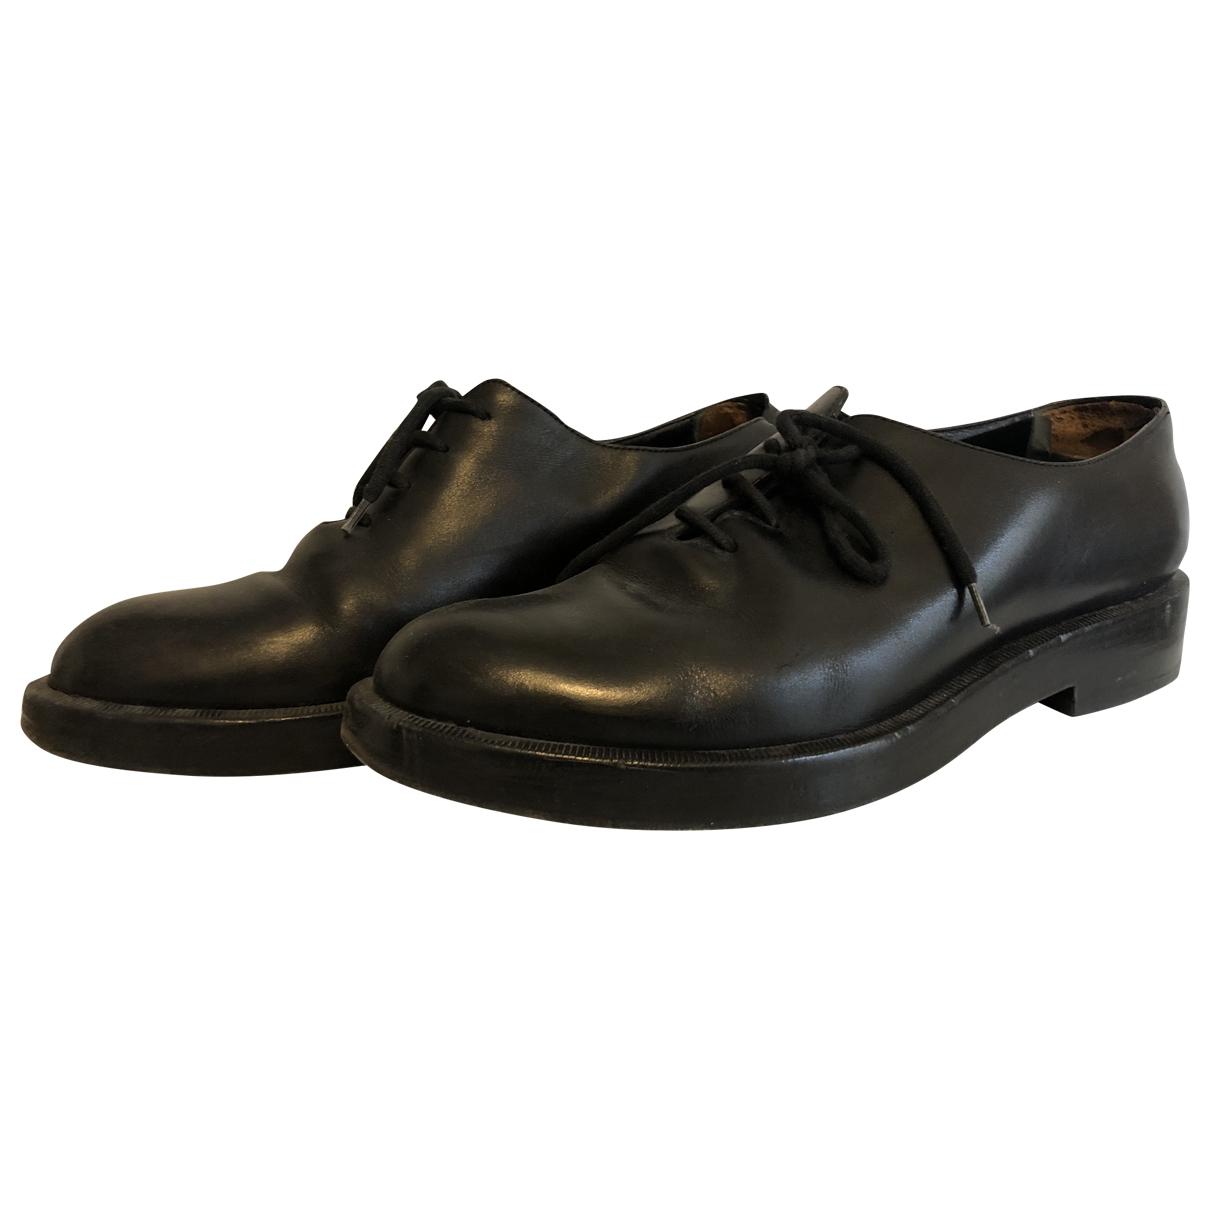 Balenciaga - Derbies   pour homme en cuir - noir